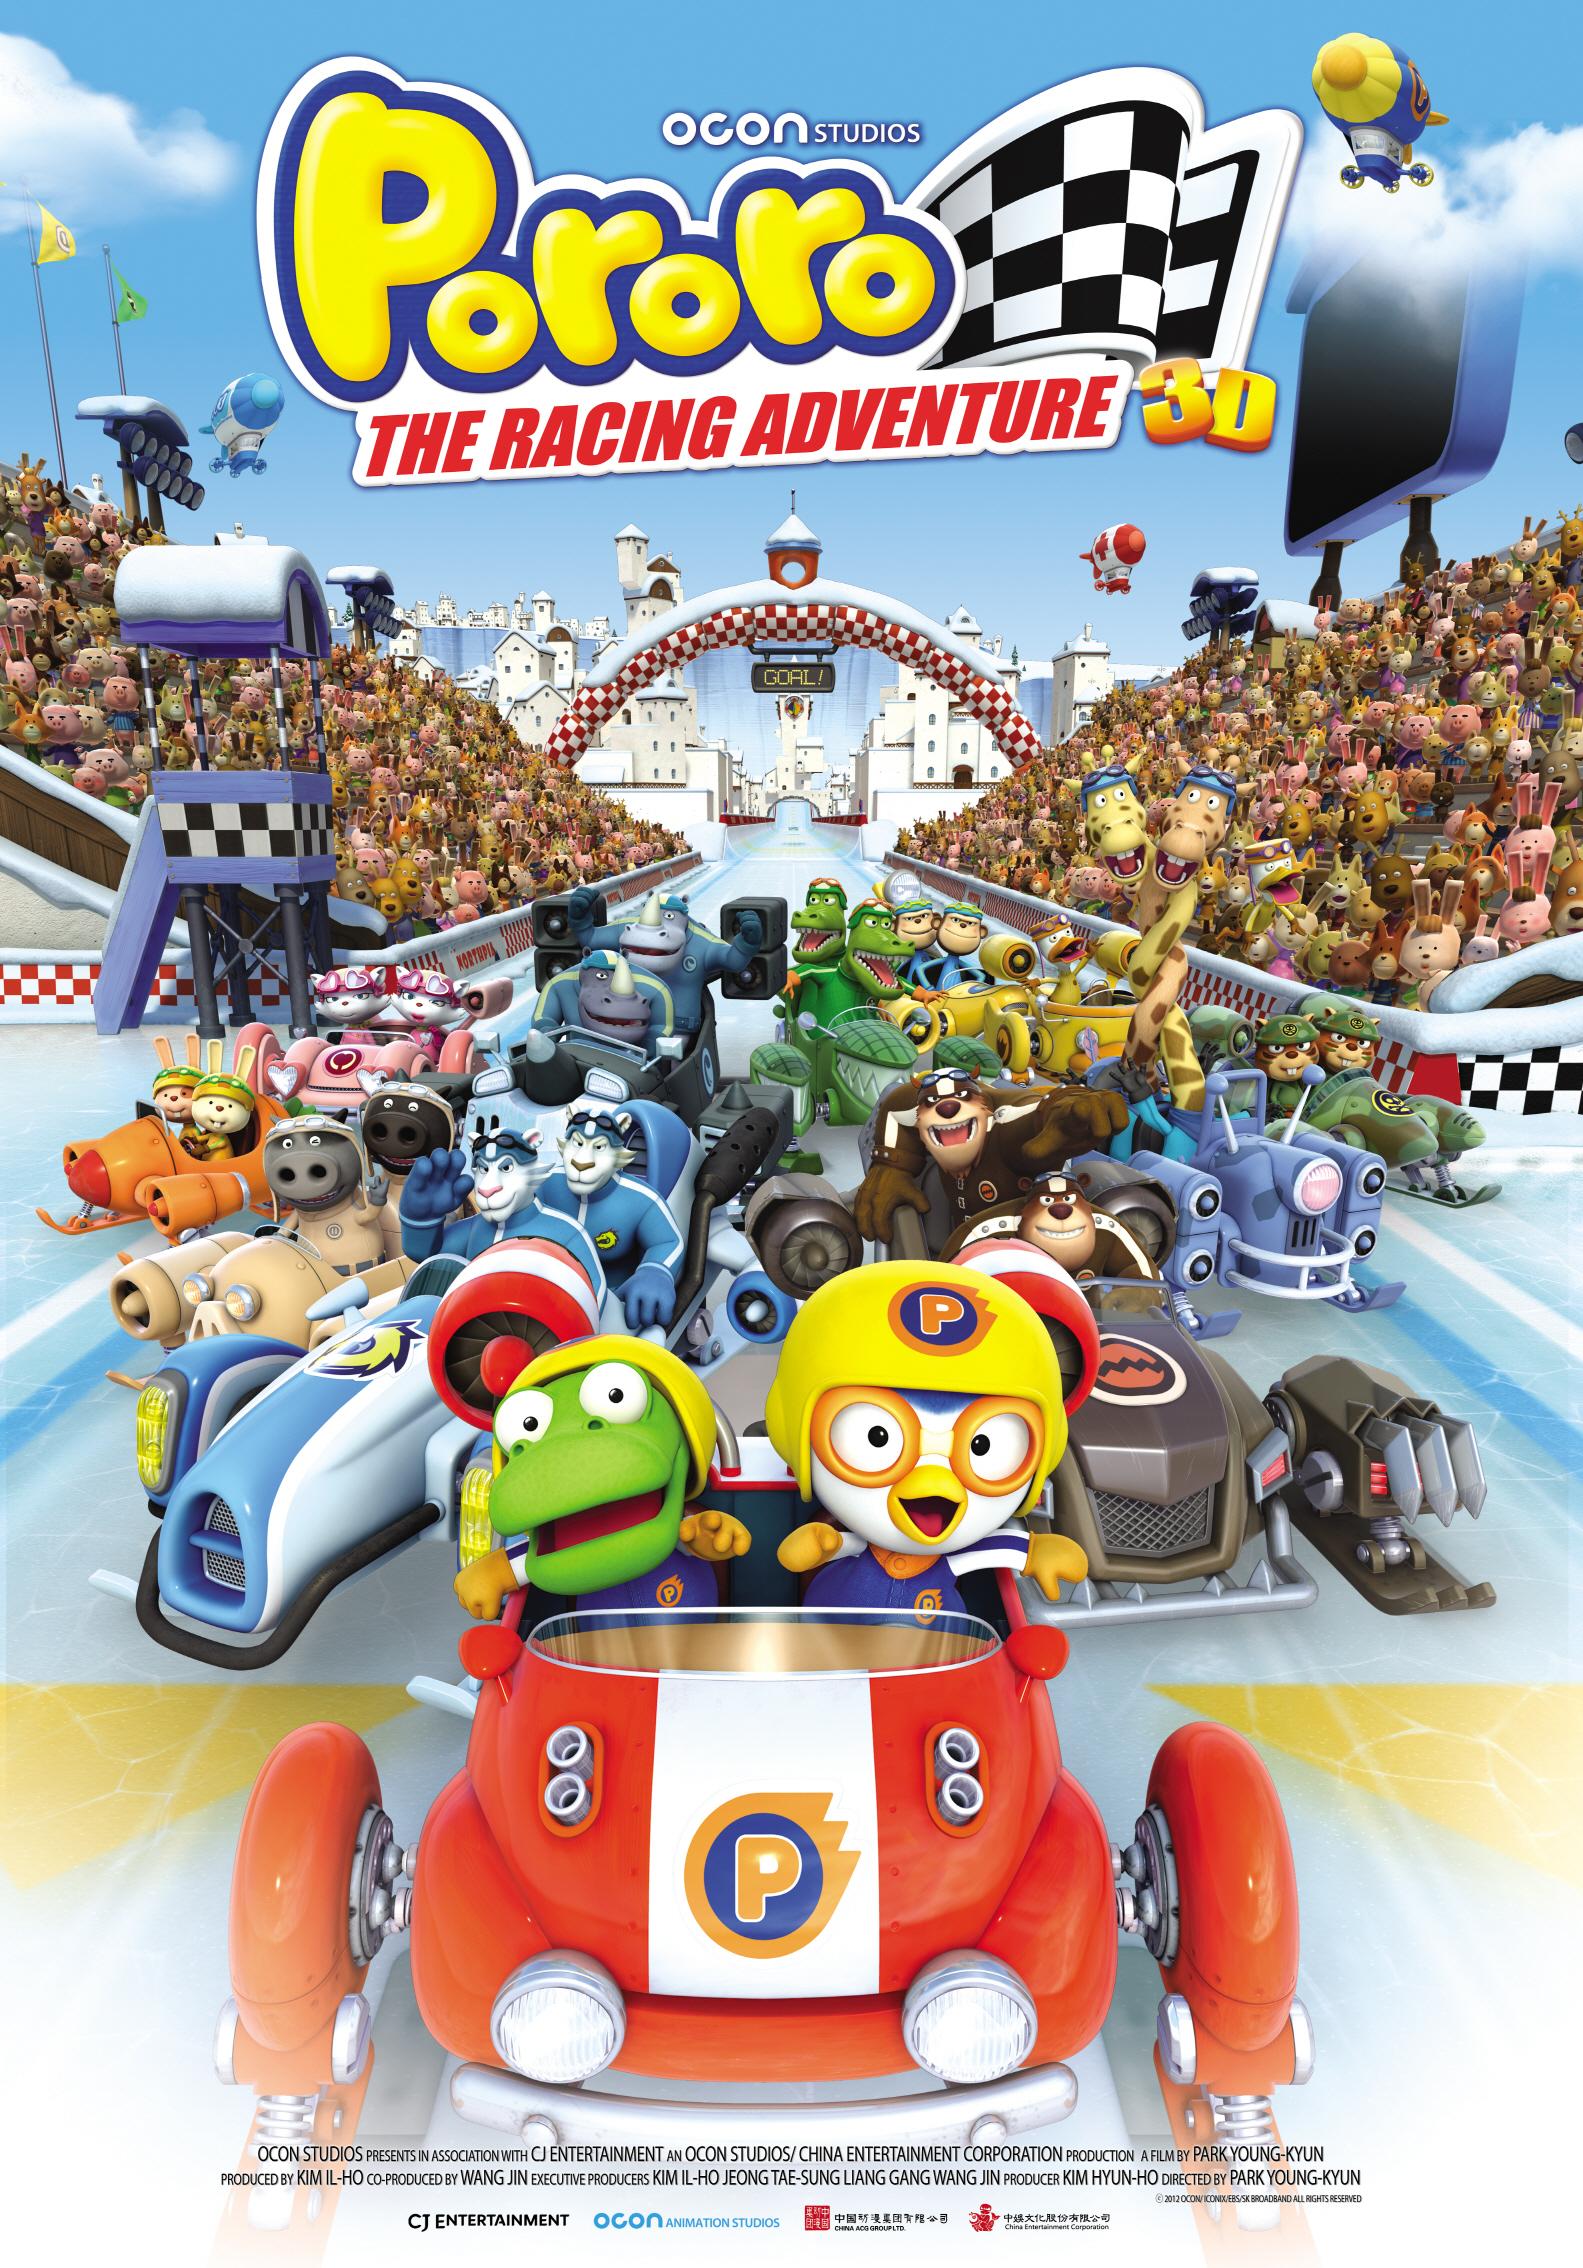 image Pororo, the Racing Adventure Watch Full Movie Free Online